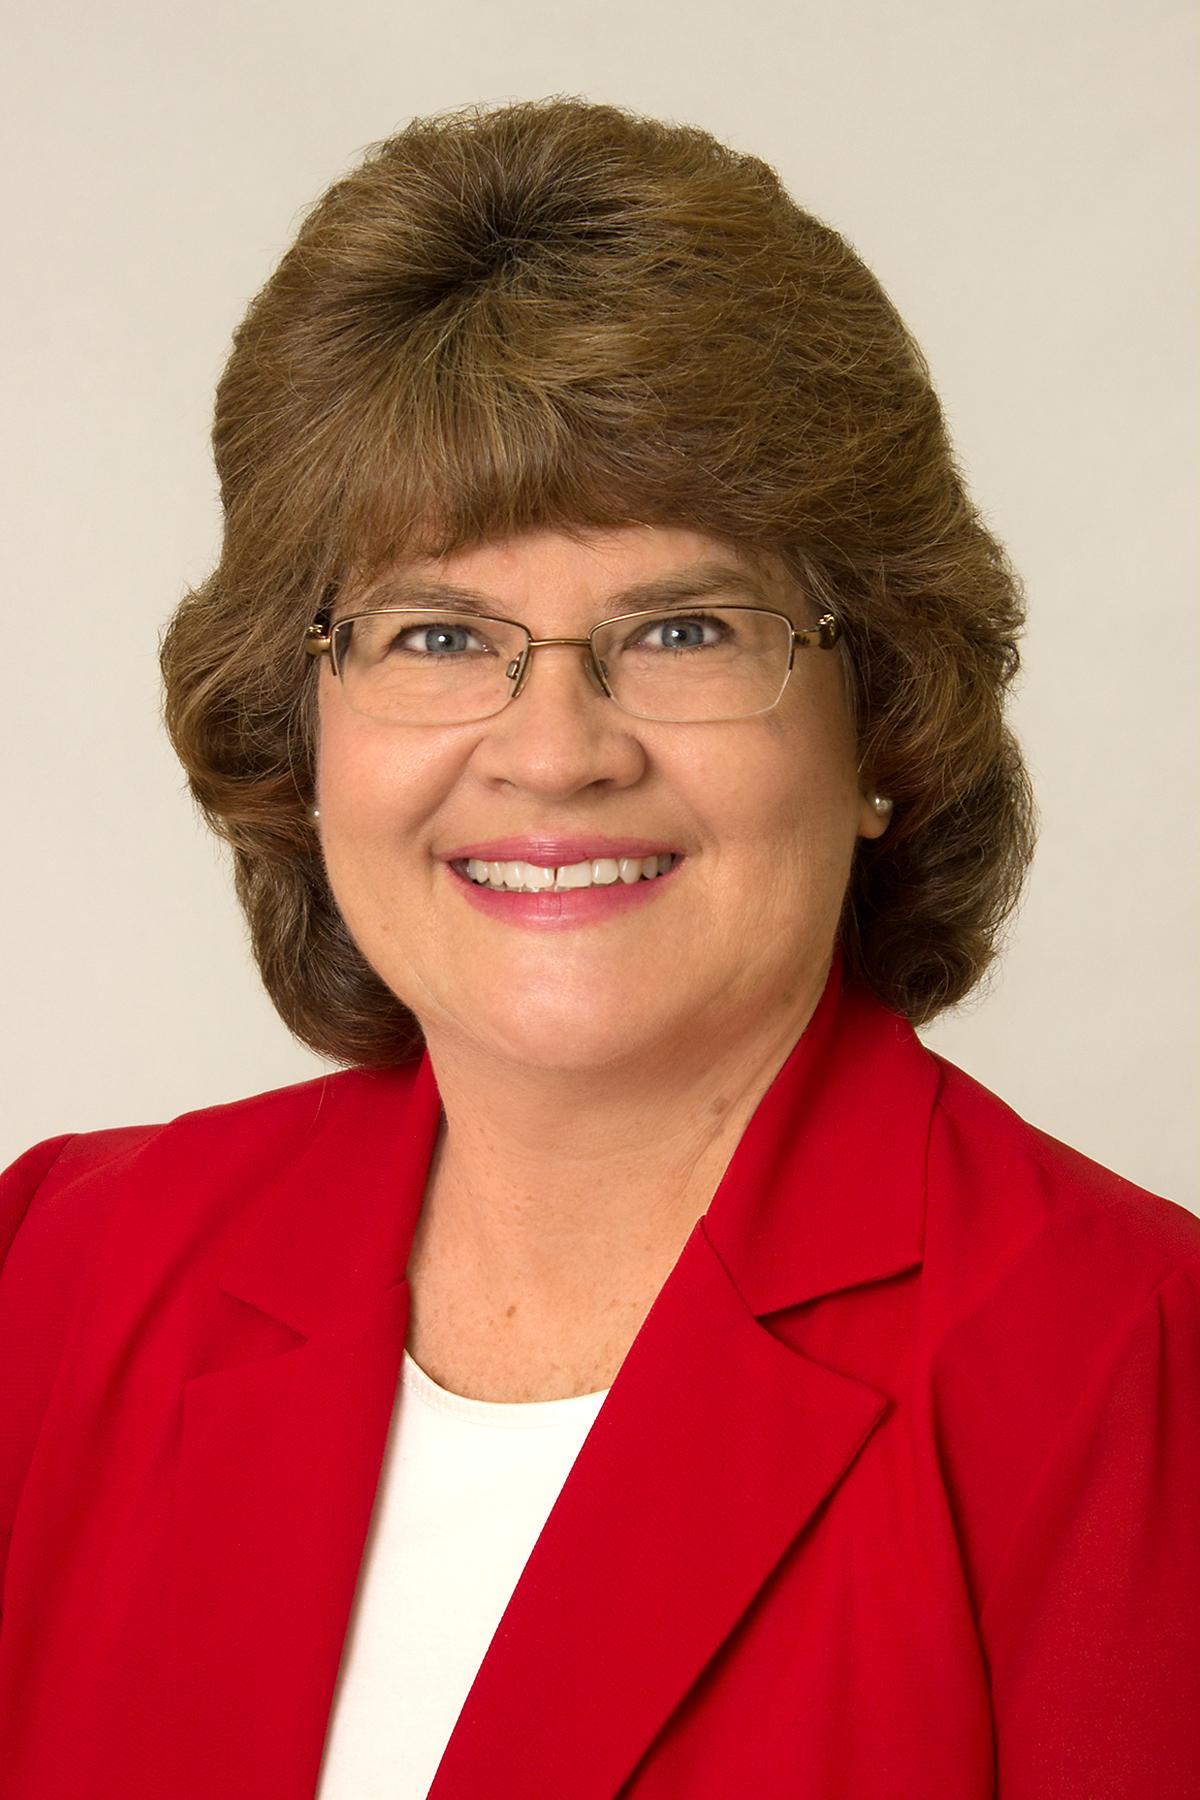 Tamara M. Hayes